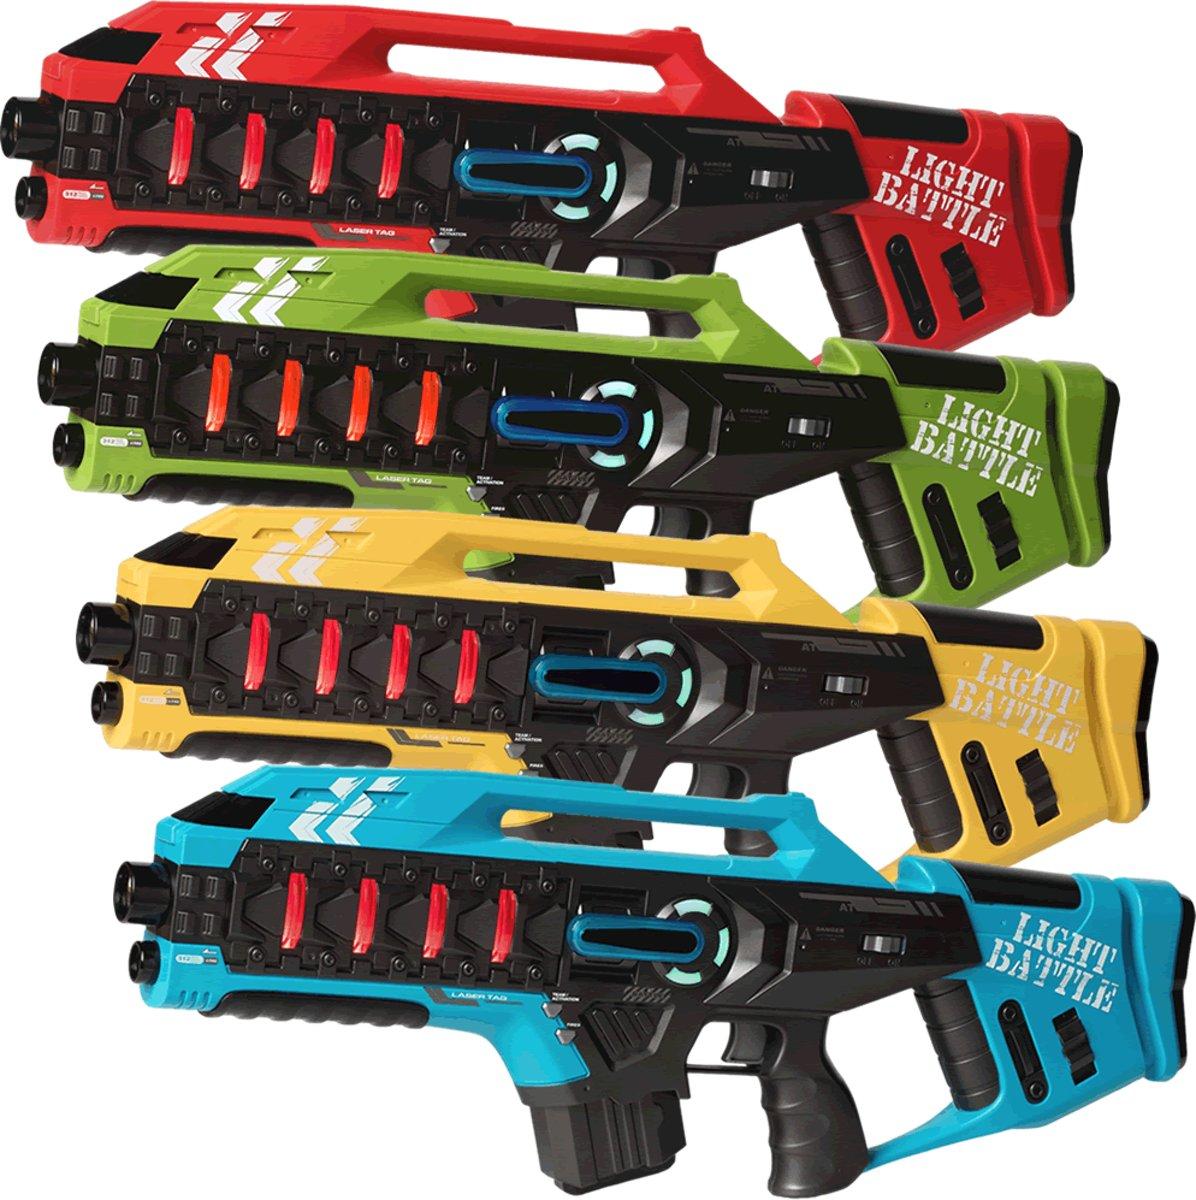 4 Light Battle Anti-Cheat Lasergame geweren